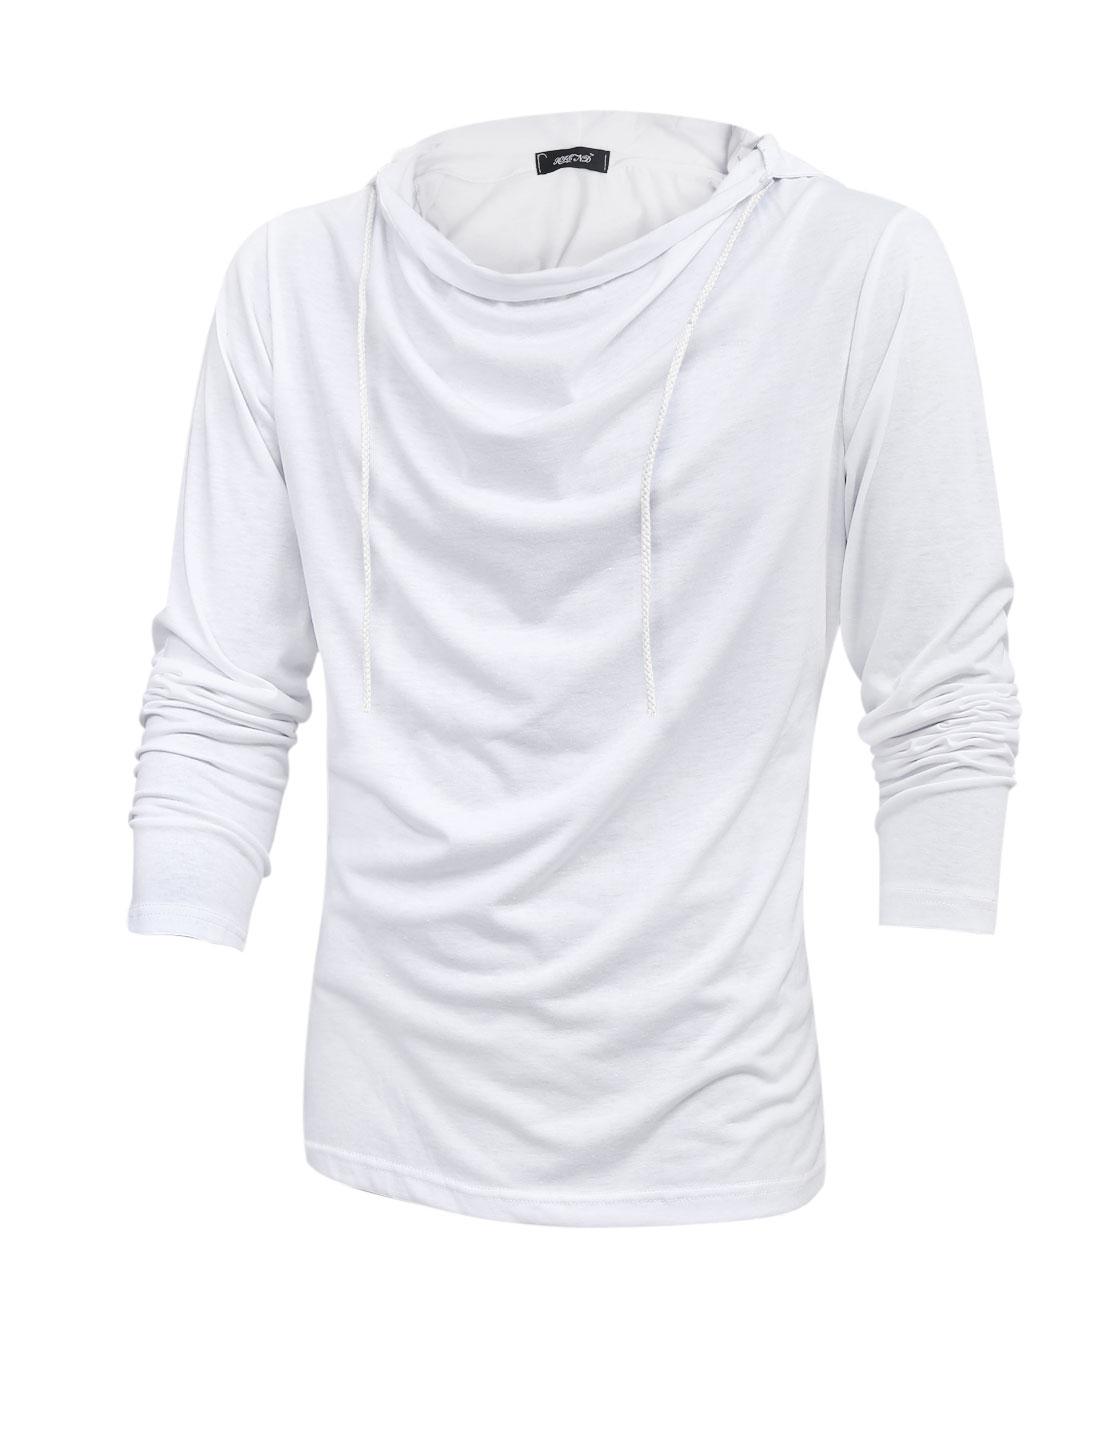 Man Drawstring Hooded Cozy Fit Sweatshirt White M